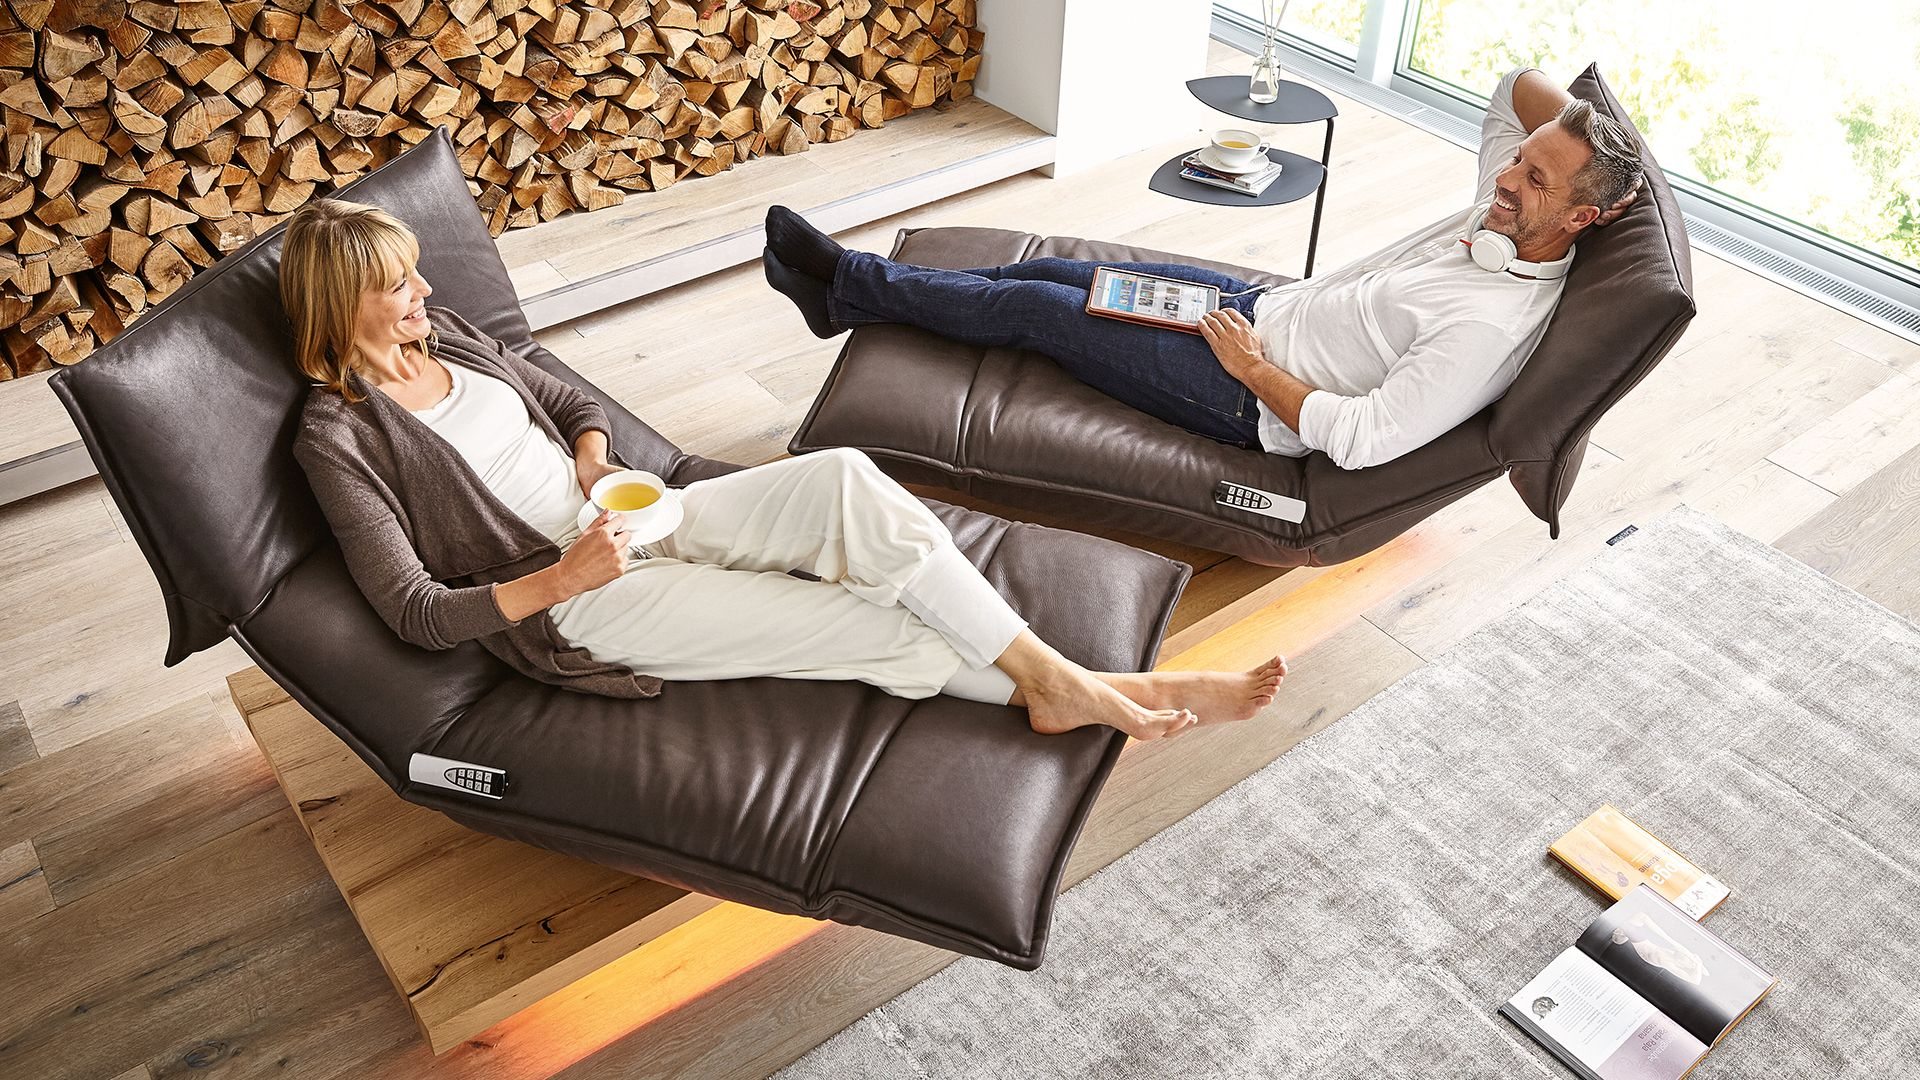 Koinor Edit Sofa Buy Online In Hong Kong Singapore Worldwide Buy Sofa Home Theater Seating Stylish Sofa